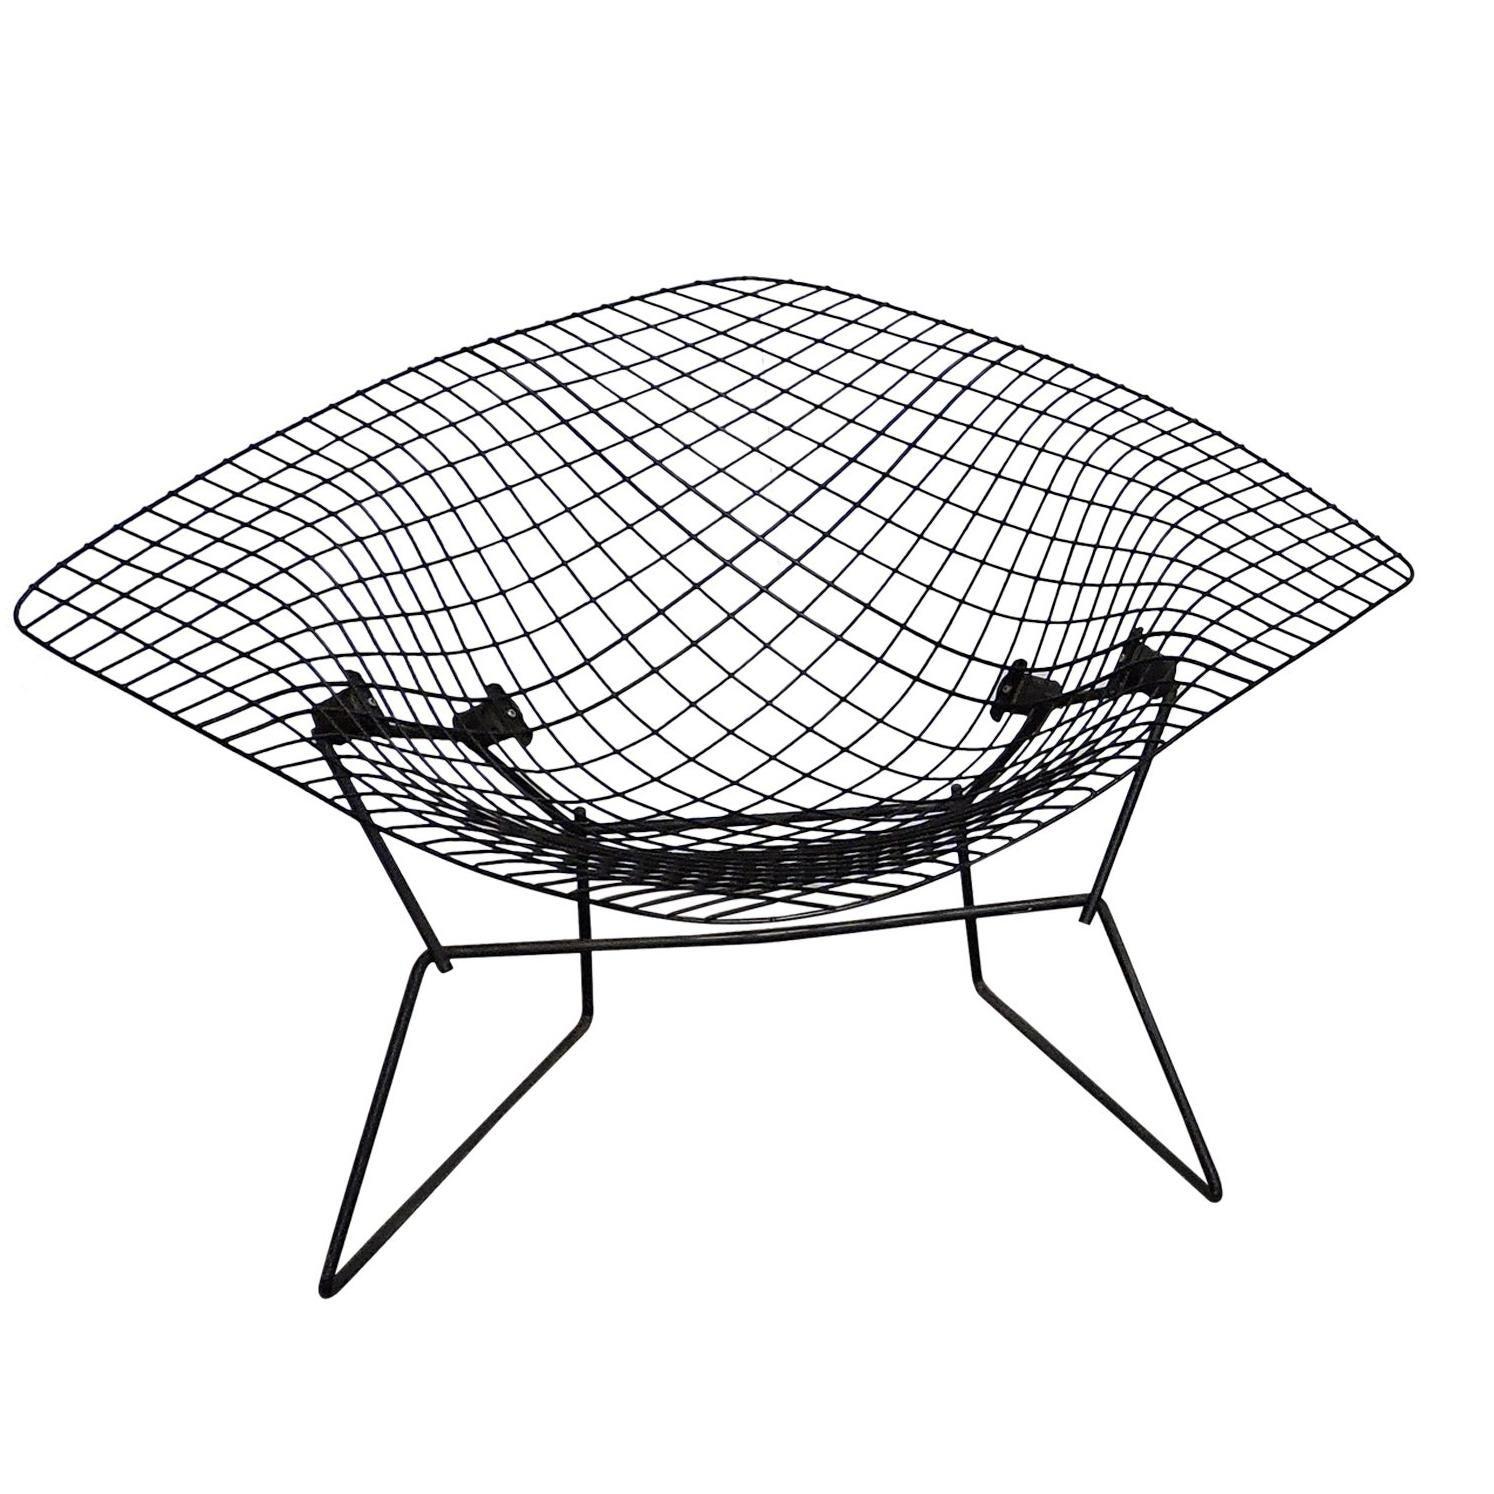 harry bertoia chairs 54 for sale at 1stdibs 1970s Oak Bedroom Furniture